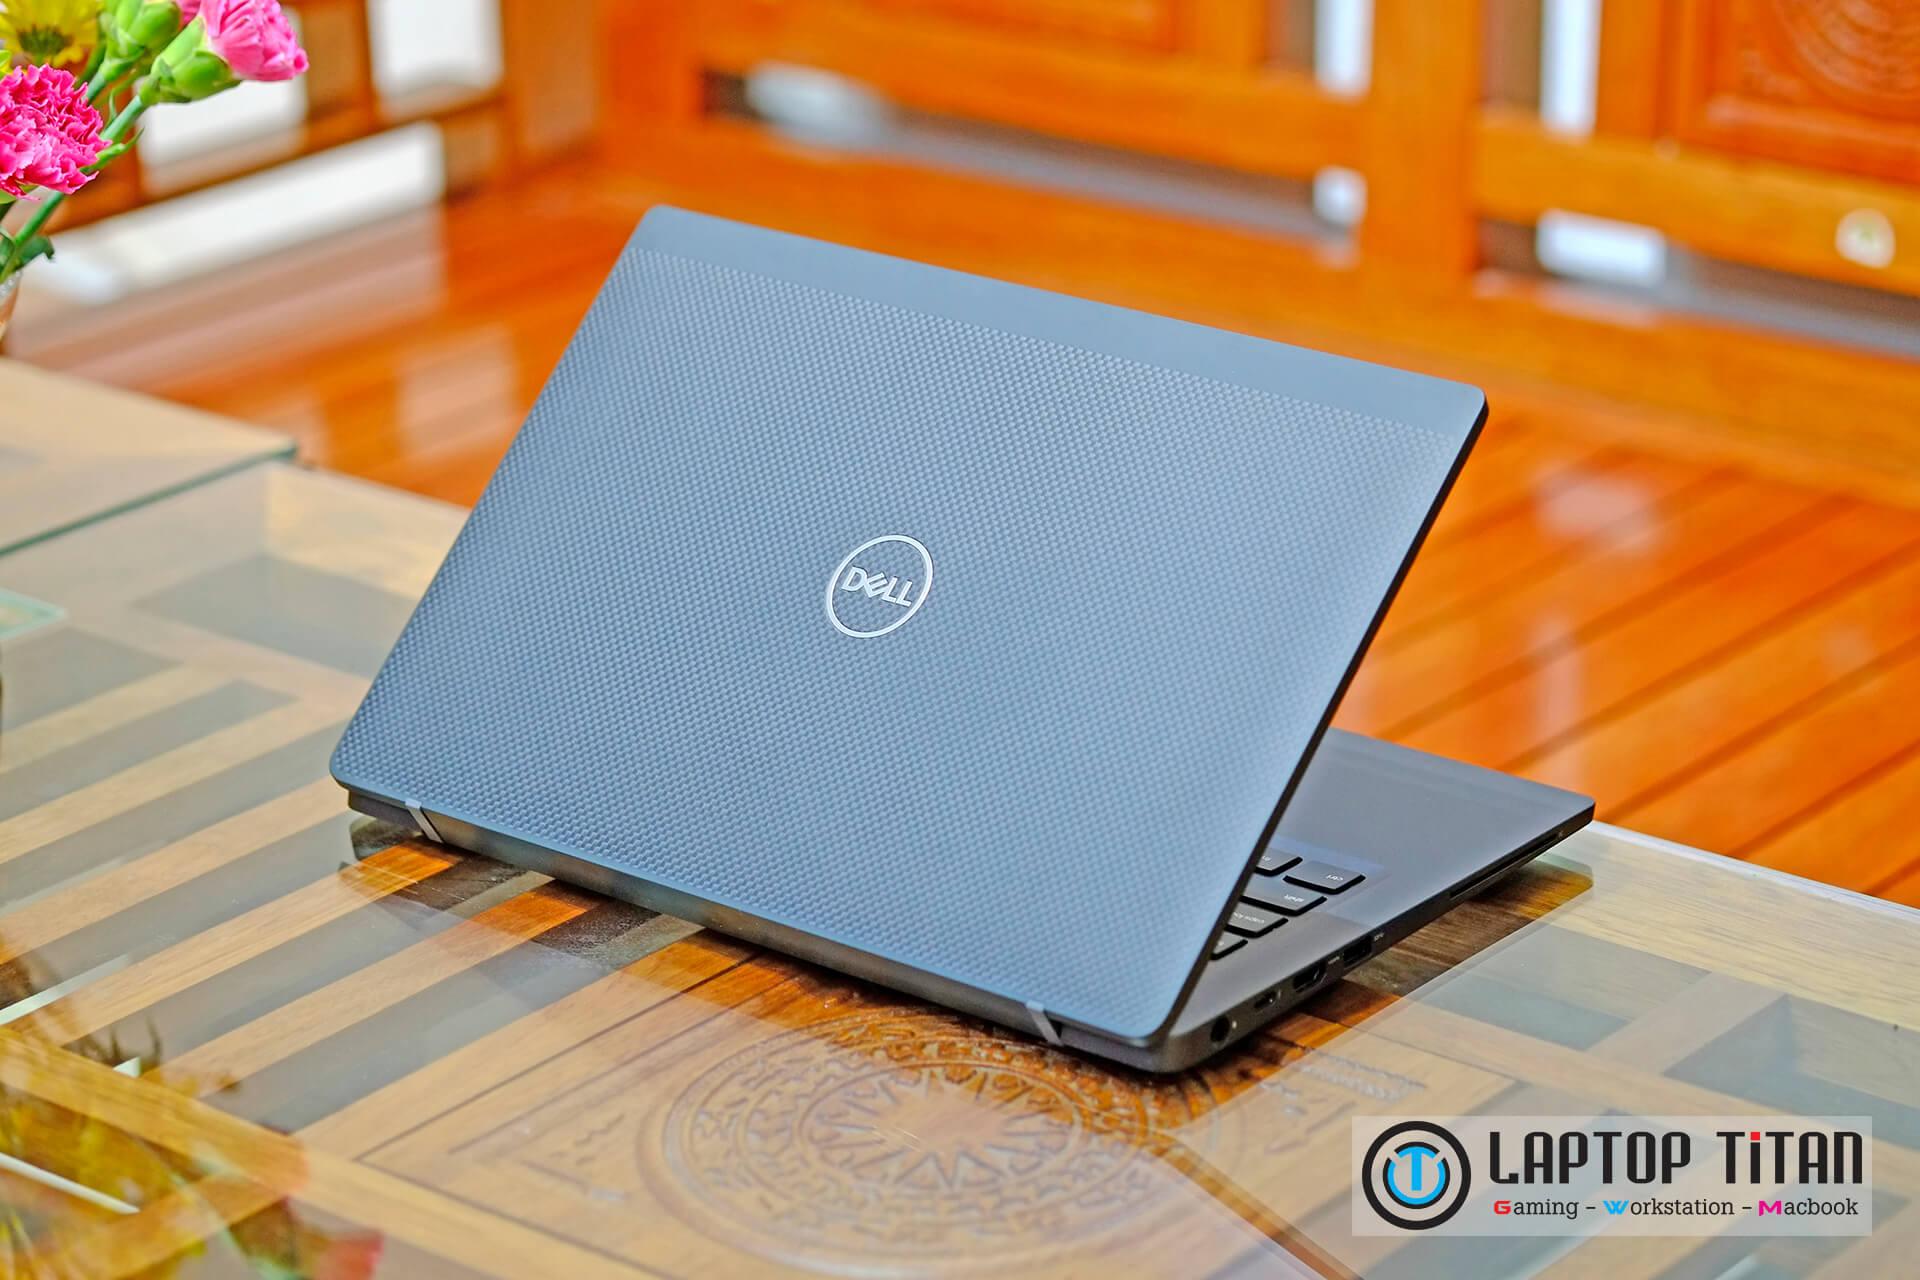 Dell Latitude 7400 Laptoptitan 08